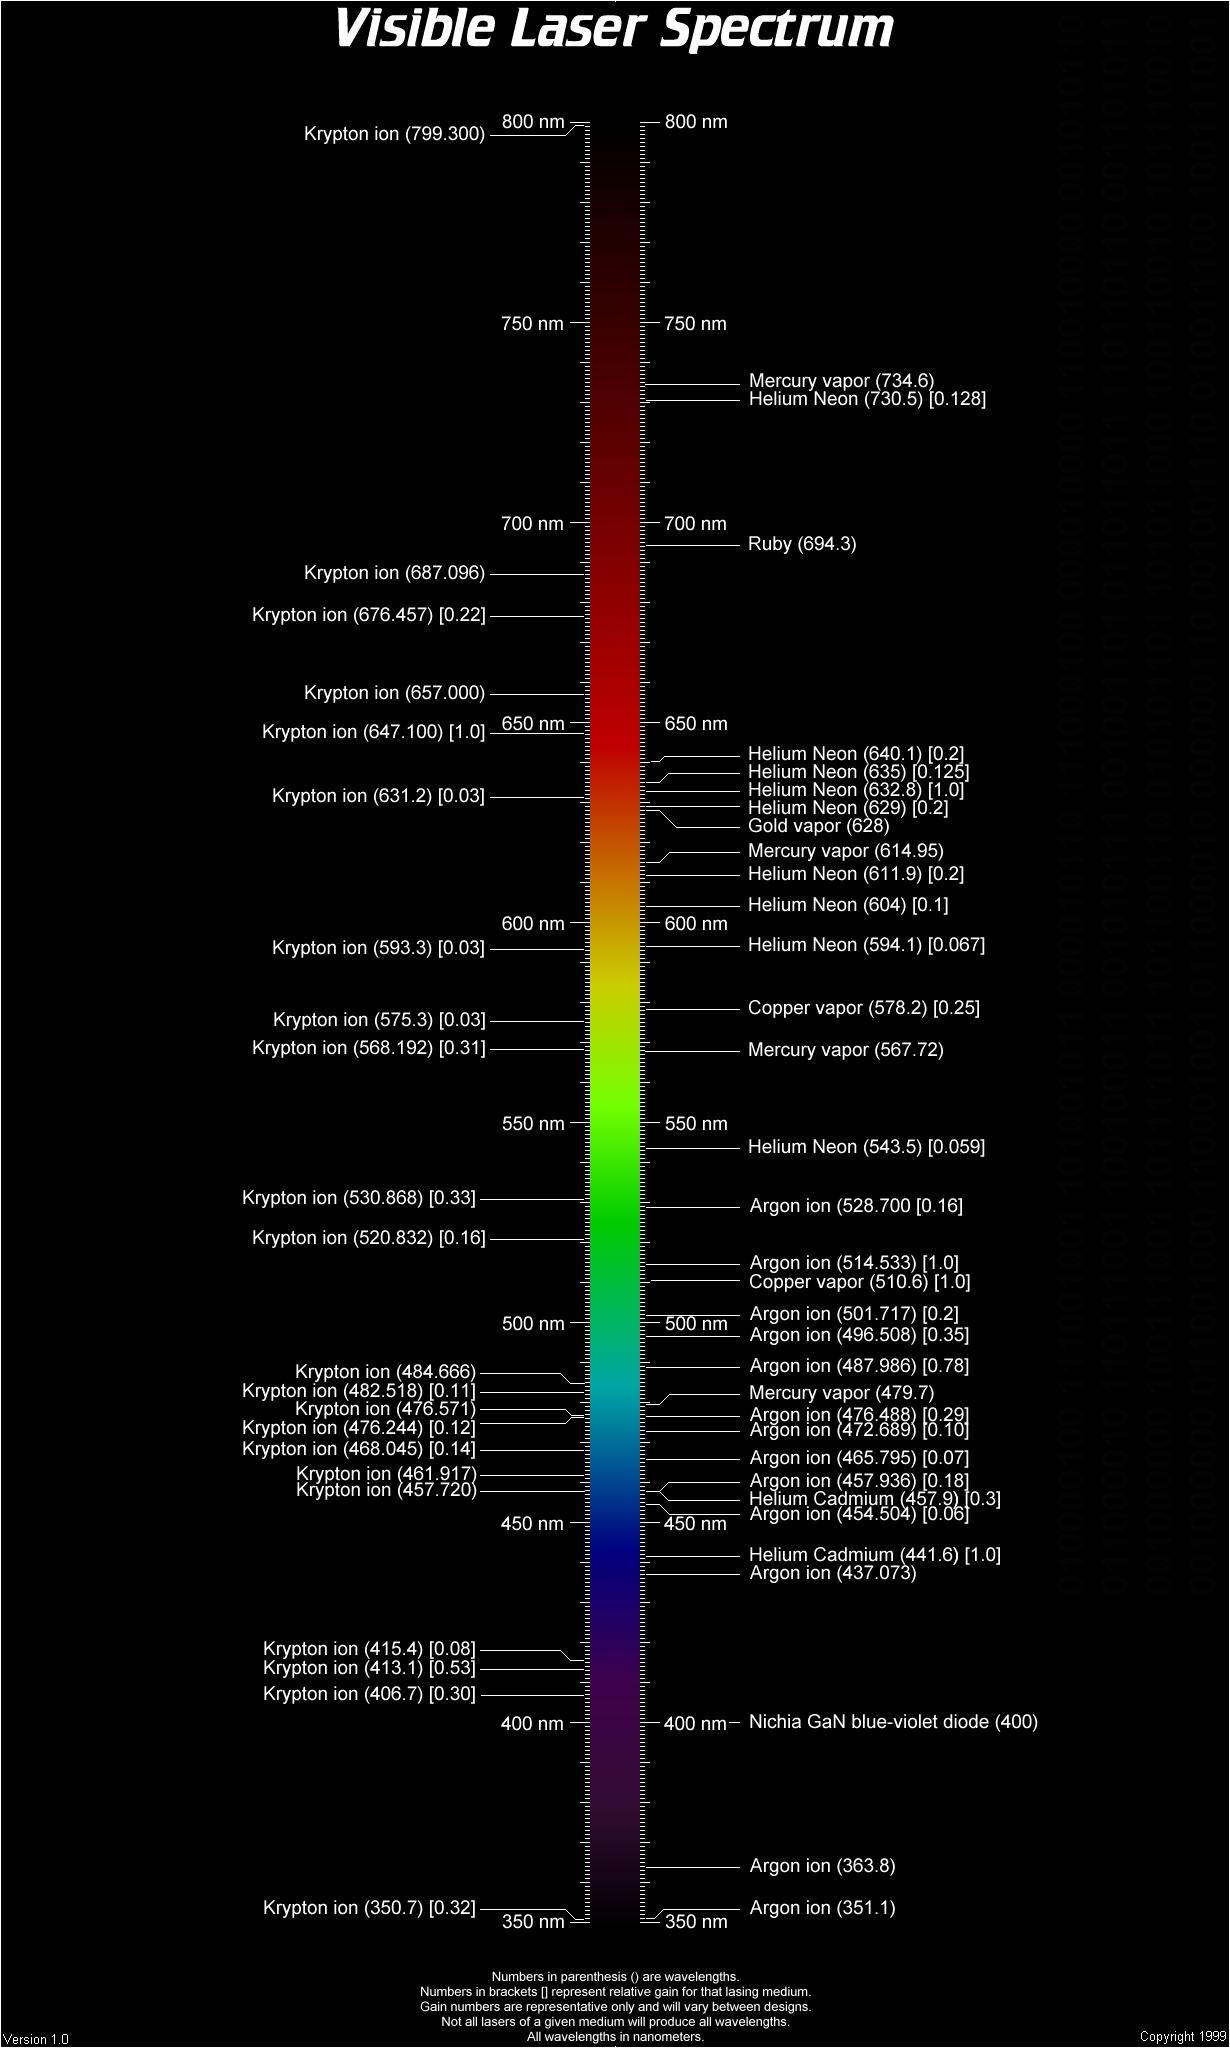 Visible Laser Spectrum